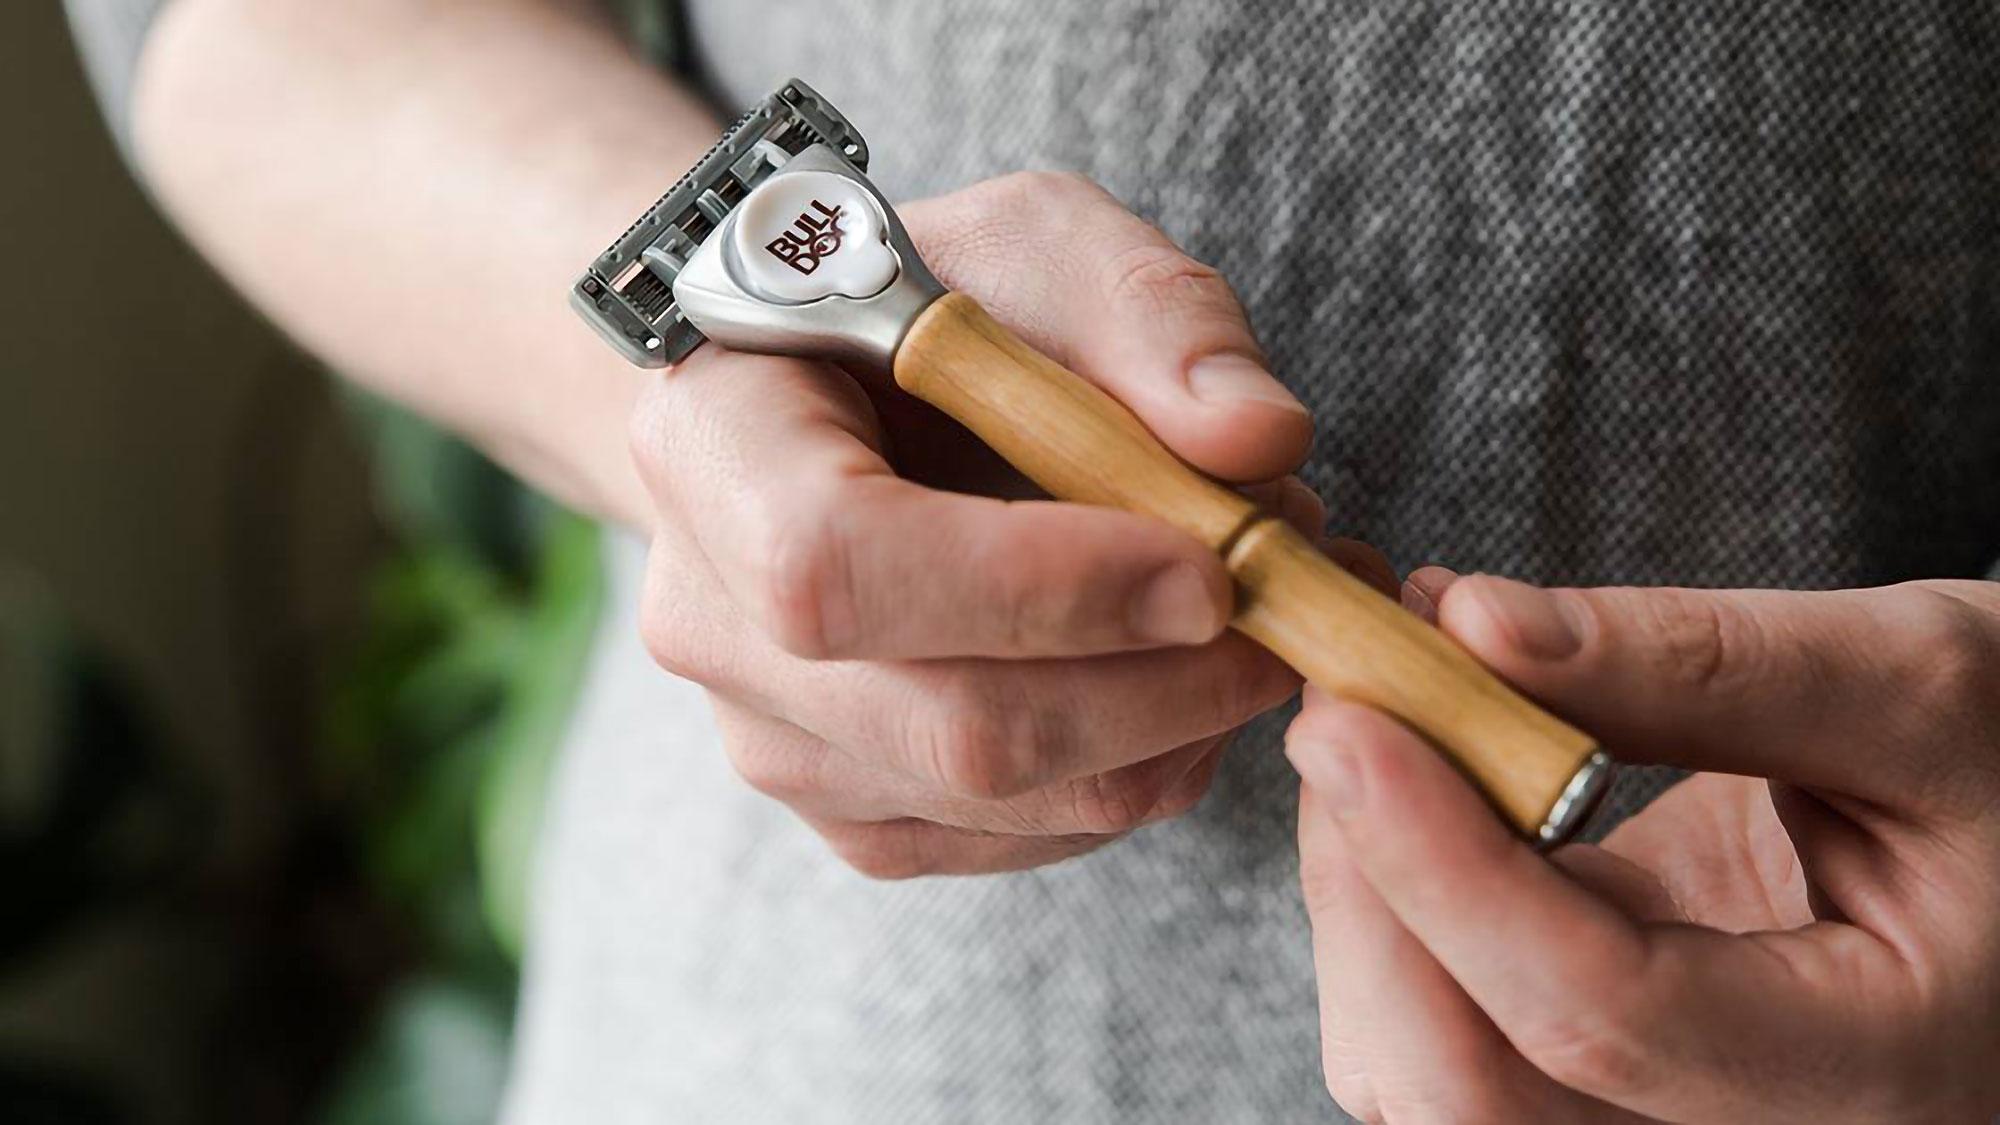 Bulldog Skincare Sensitive Bamboo Razor